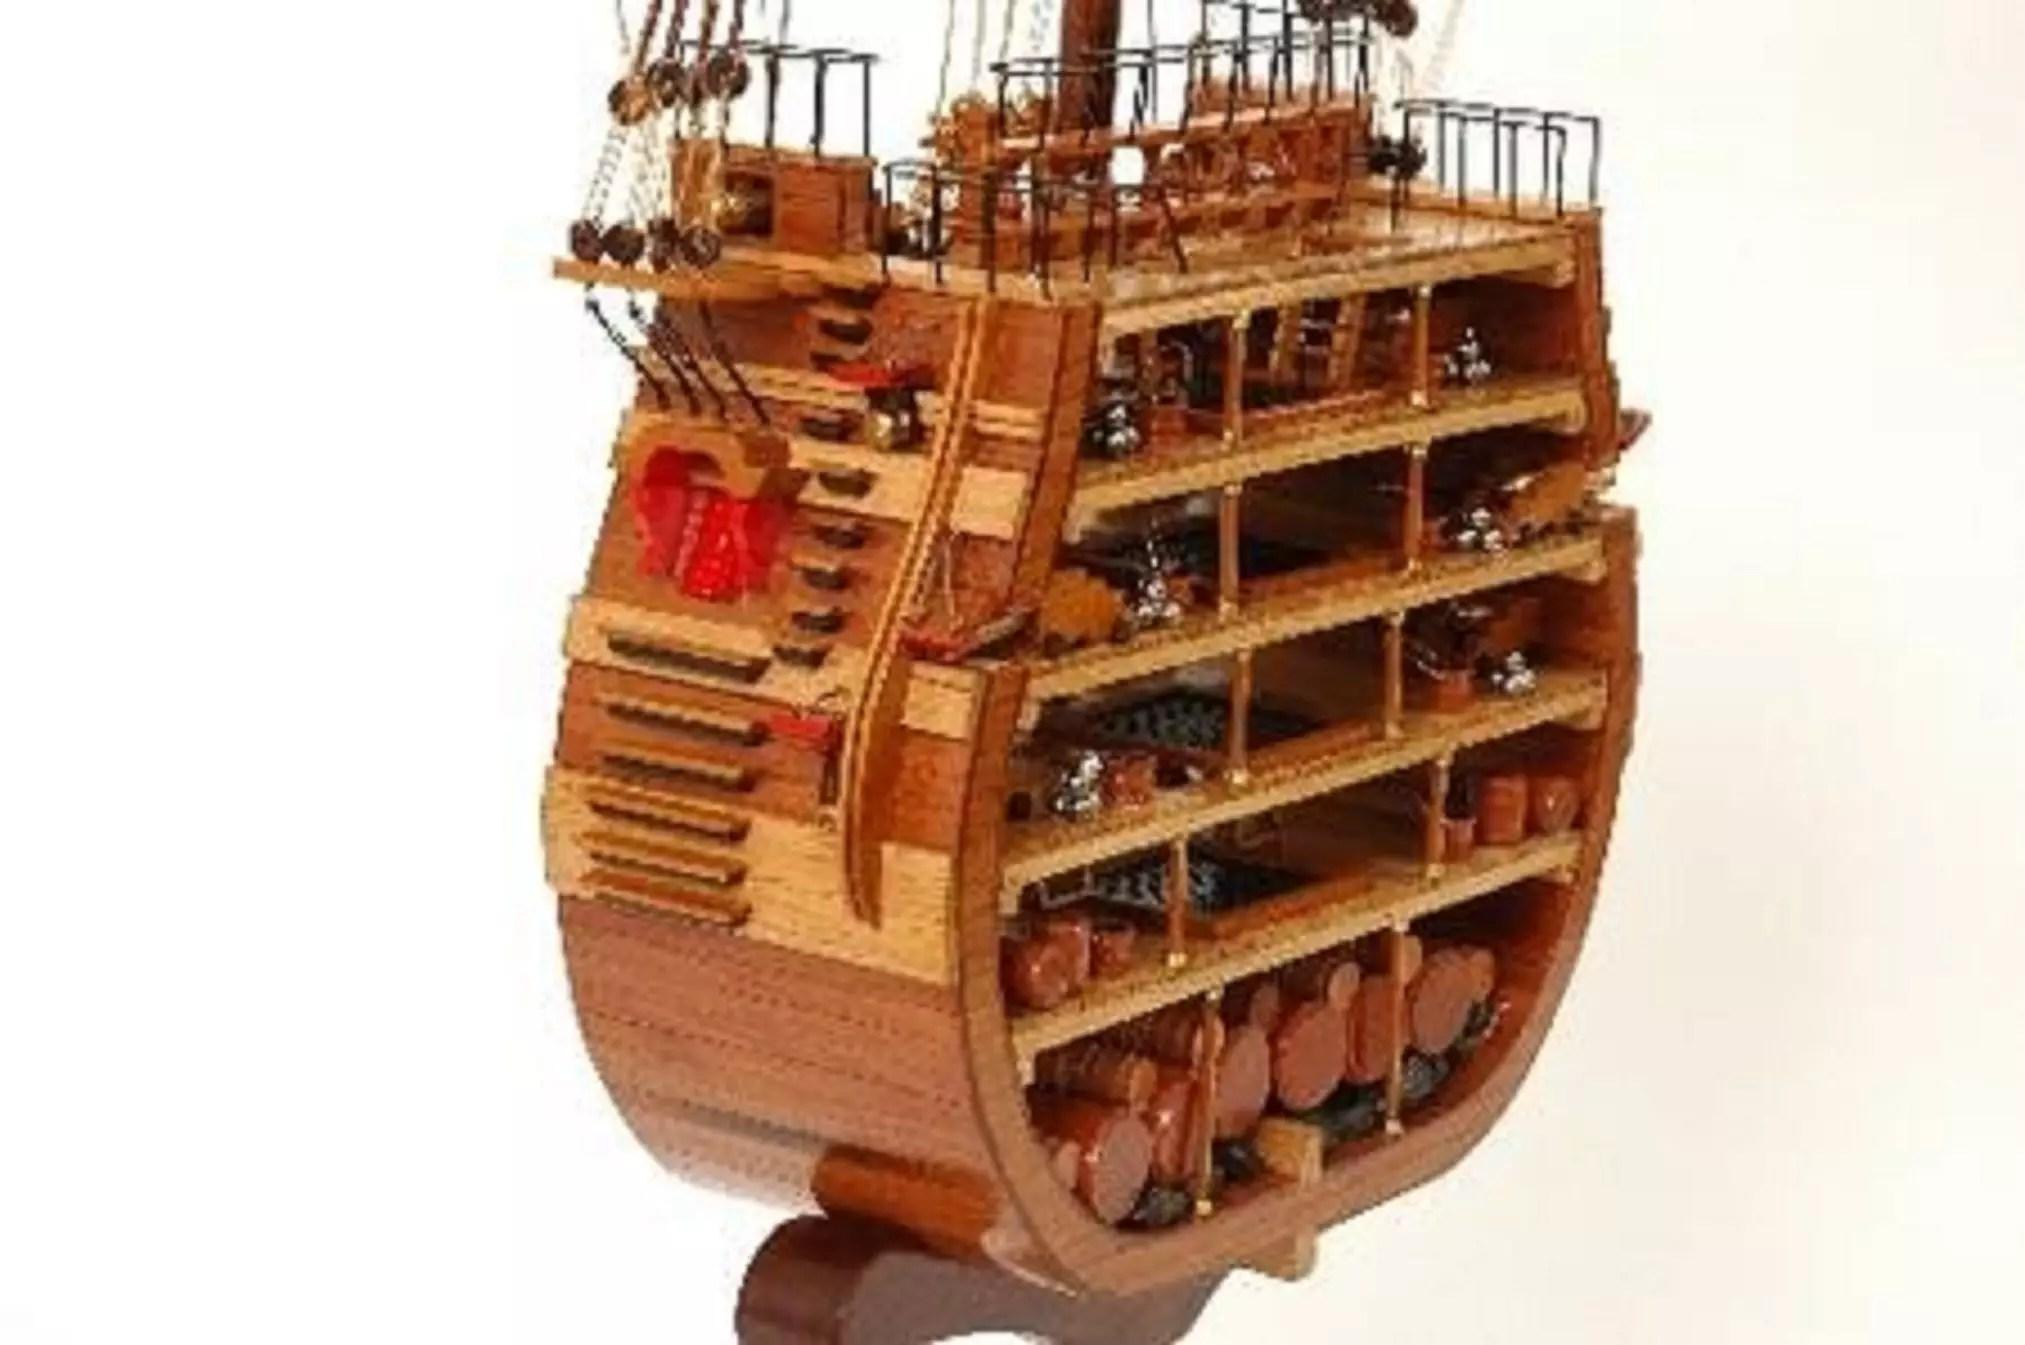 Hms Victory Cross Section Model Ship Premier Range Wooden